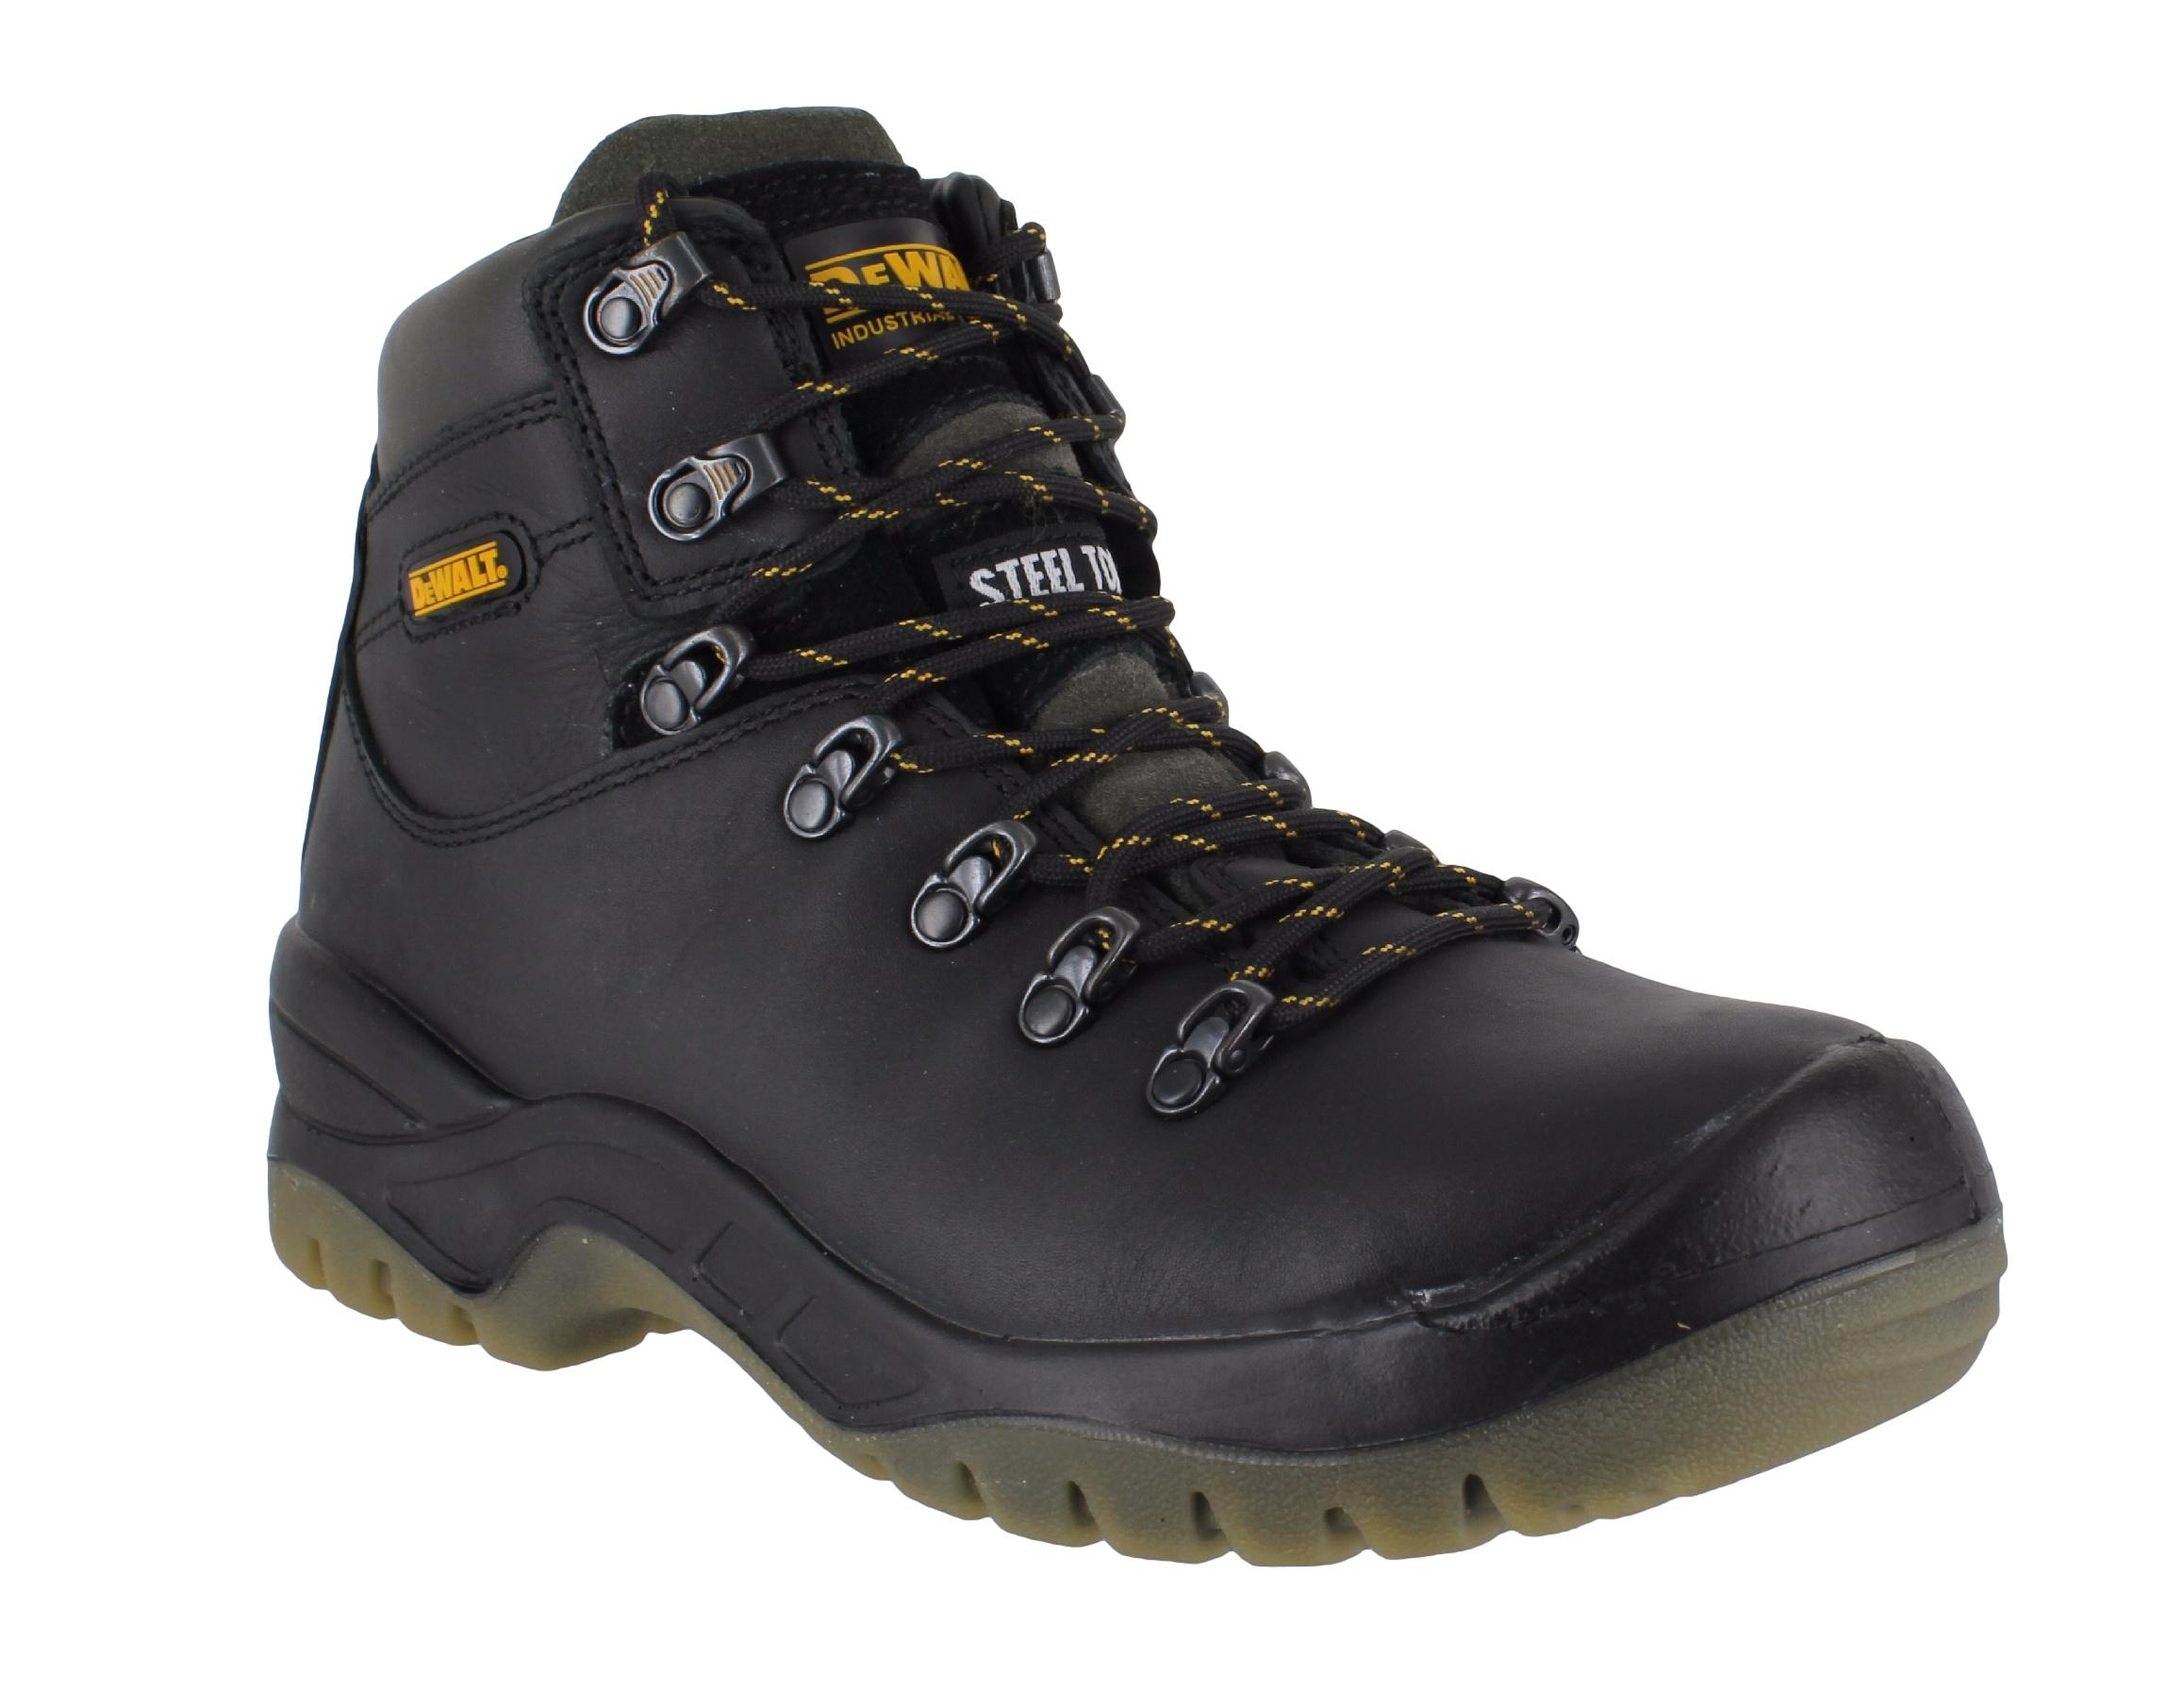 DeWalt Demolition Mens Heavy Duty Steel Toe S3 Black Safety Work Boots | EBay